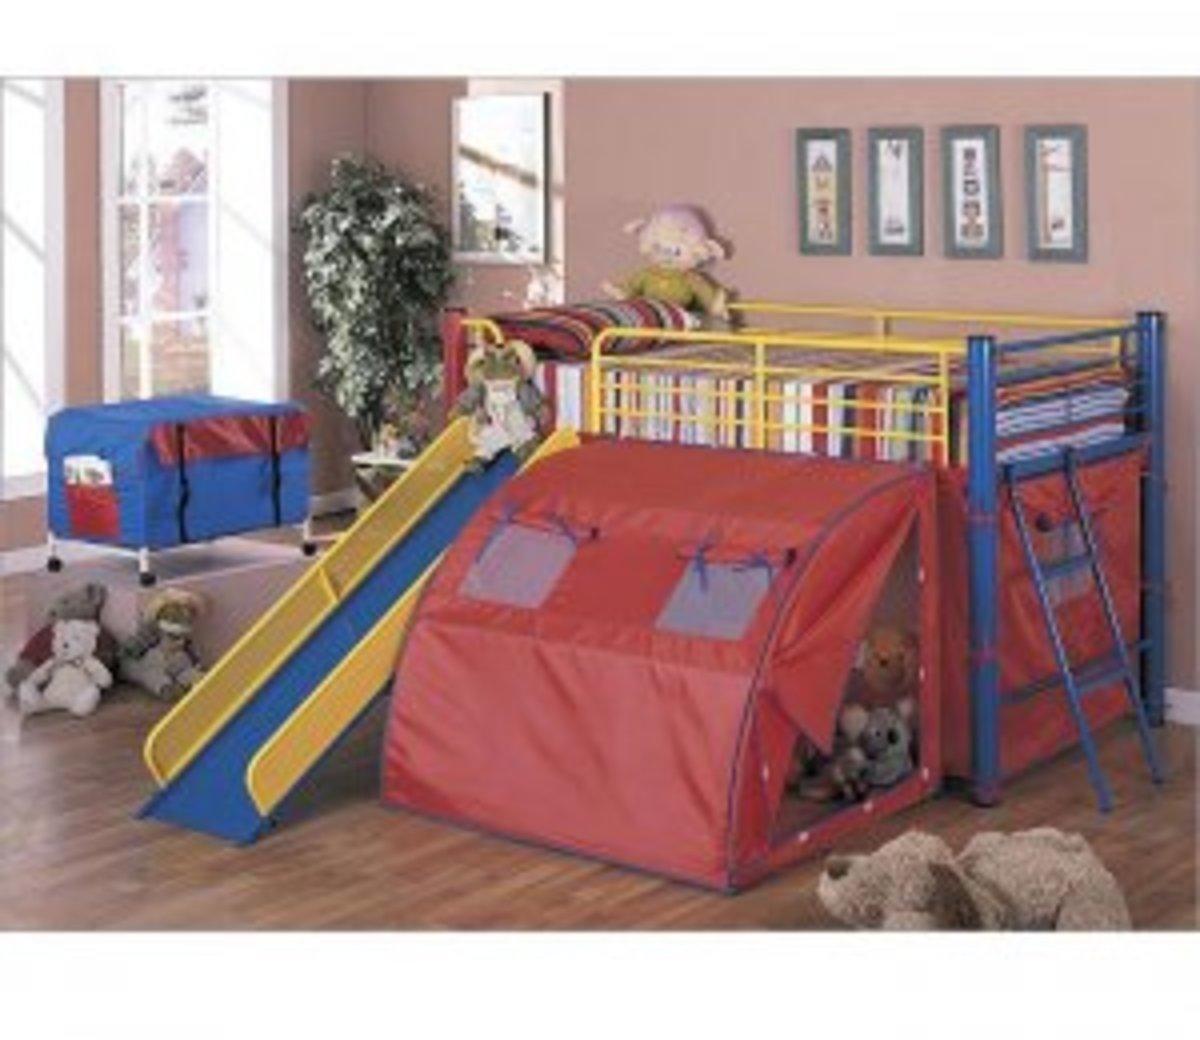 bunk beds with slides for boys and girls loft beds cheap bunk beds sale. Black Bedroom Furniture Sets. Home Design Ideas